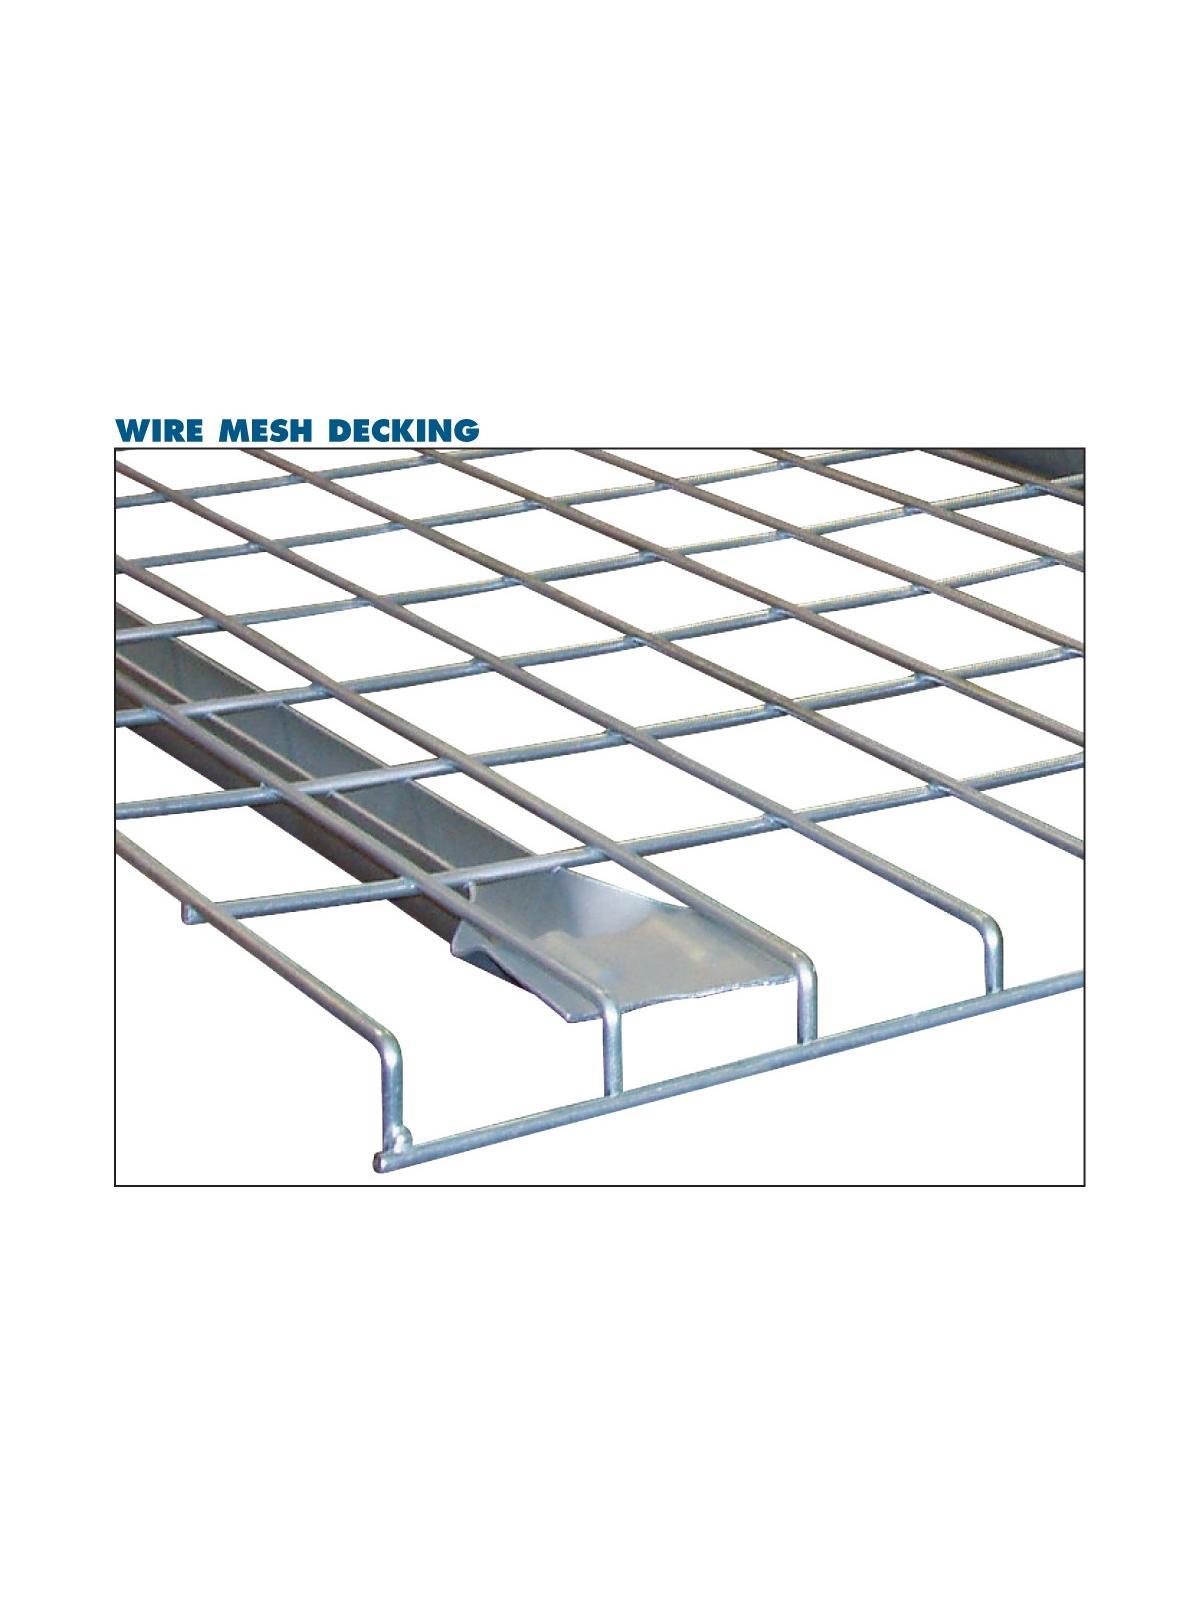 Jaken Pallet Rack Wire Mesh Decking | Indoff, Inc.